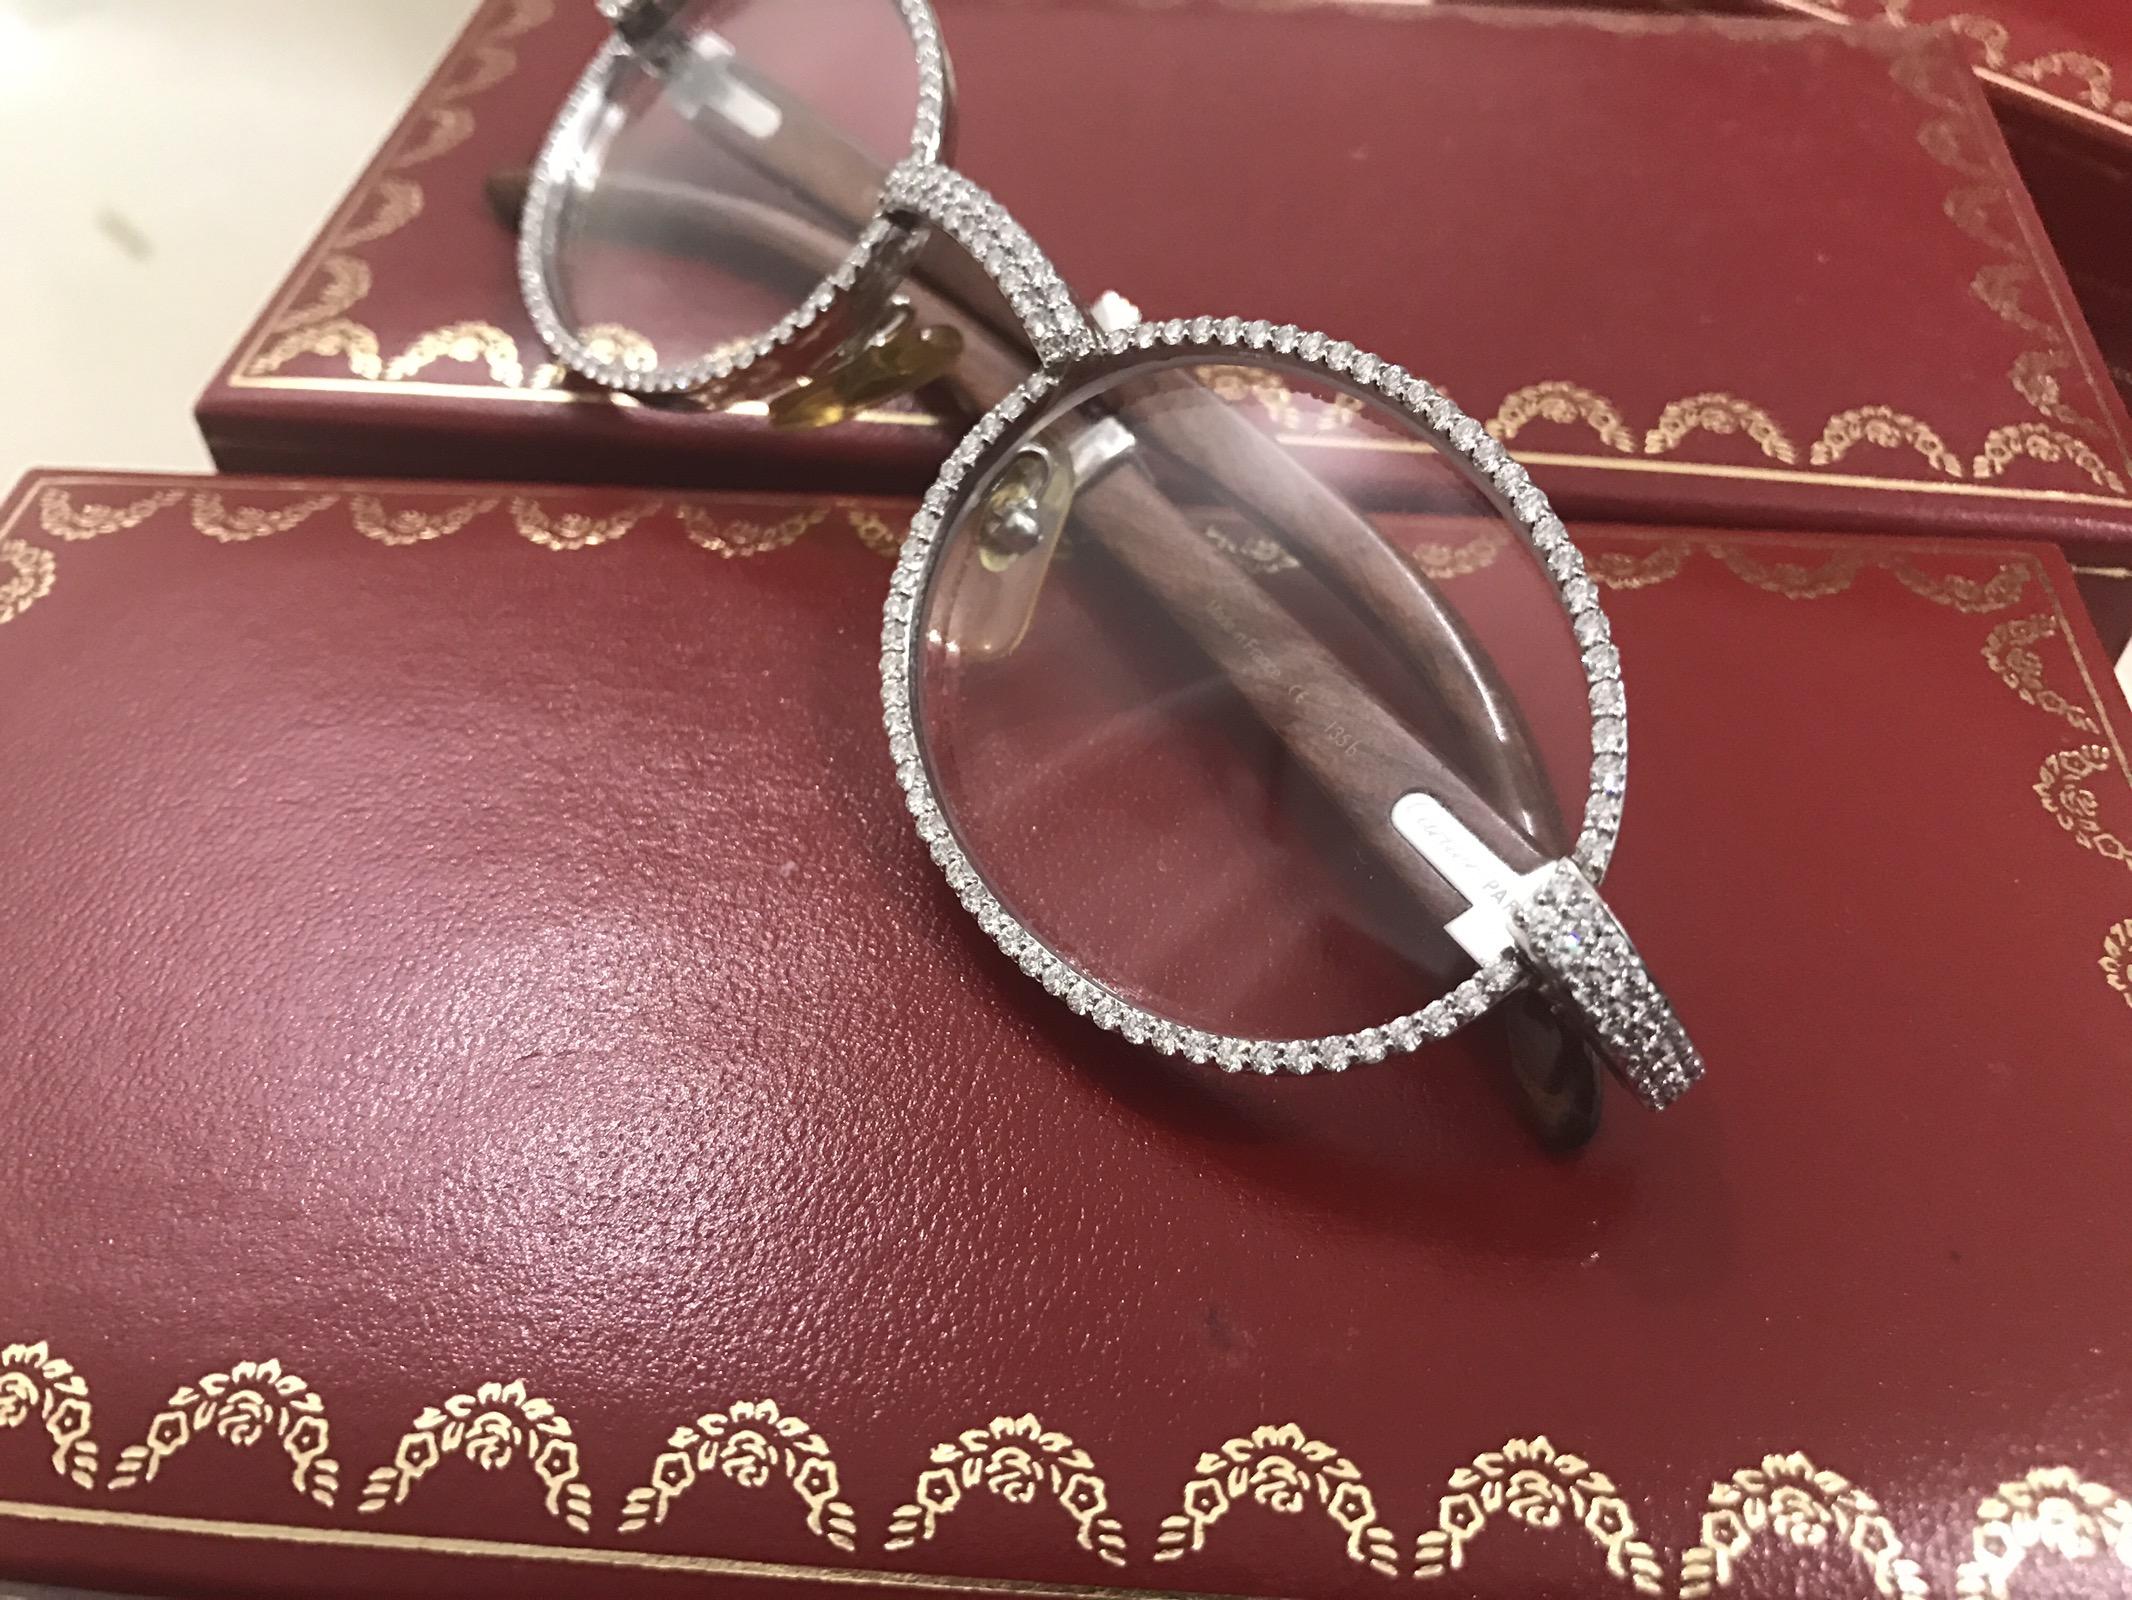 d1a480e34b Cartier Diamond Eyewear - eyewear near me